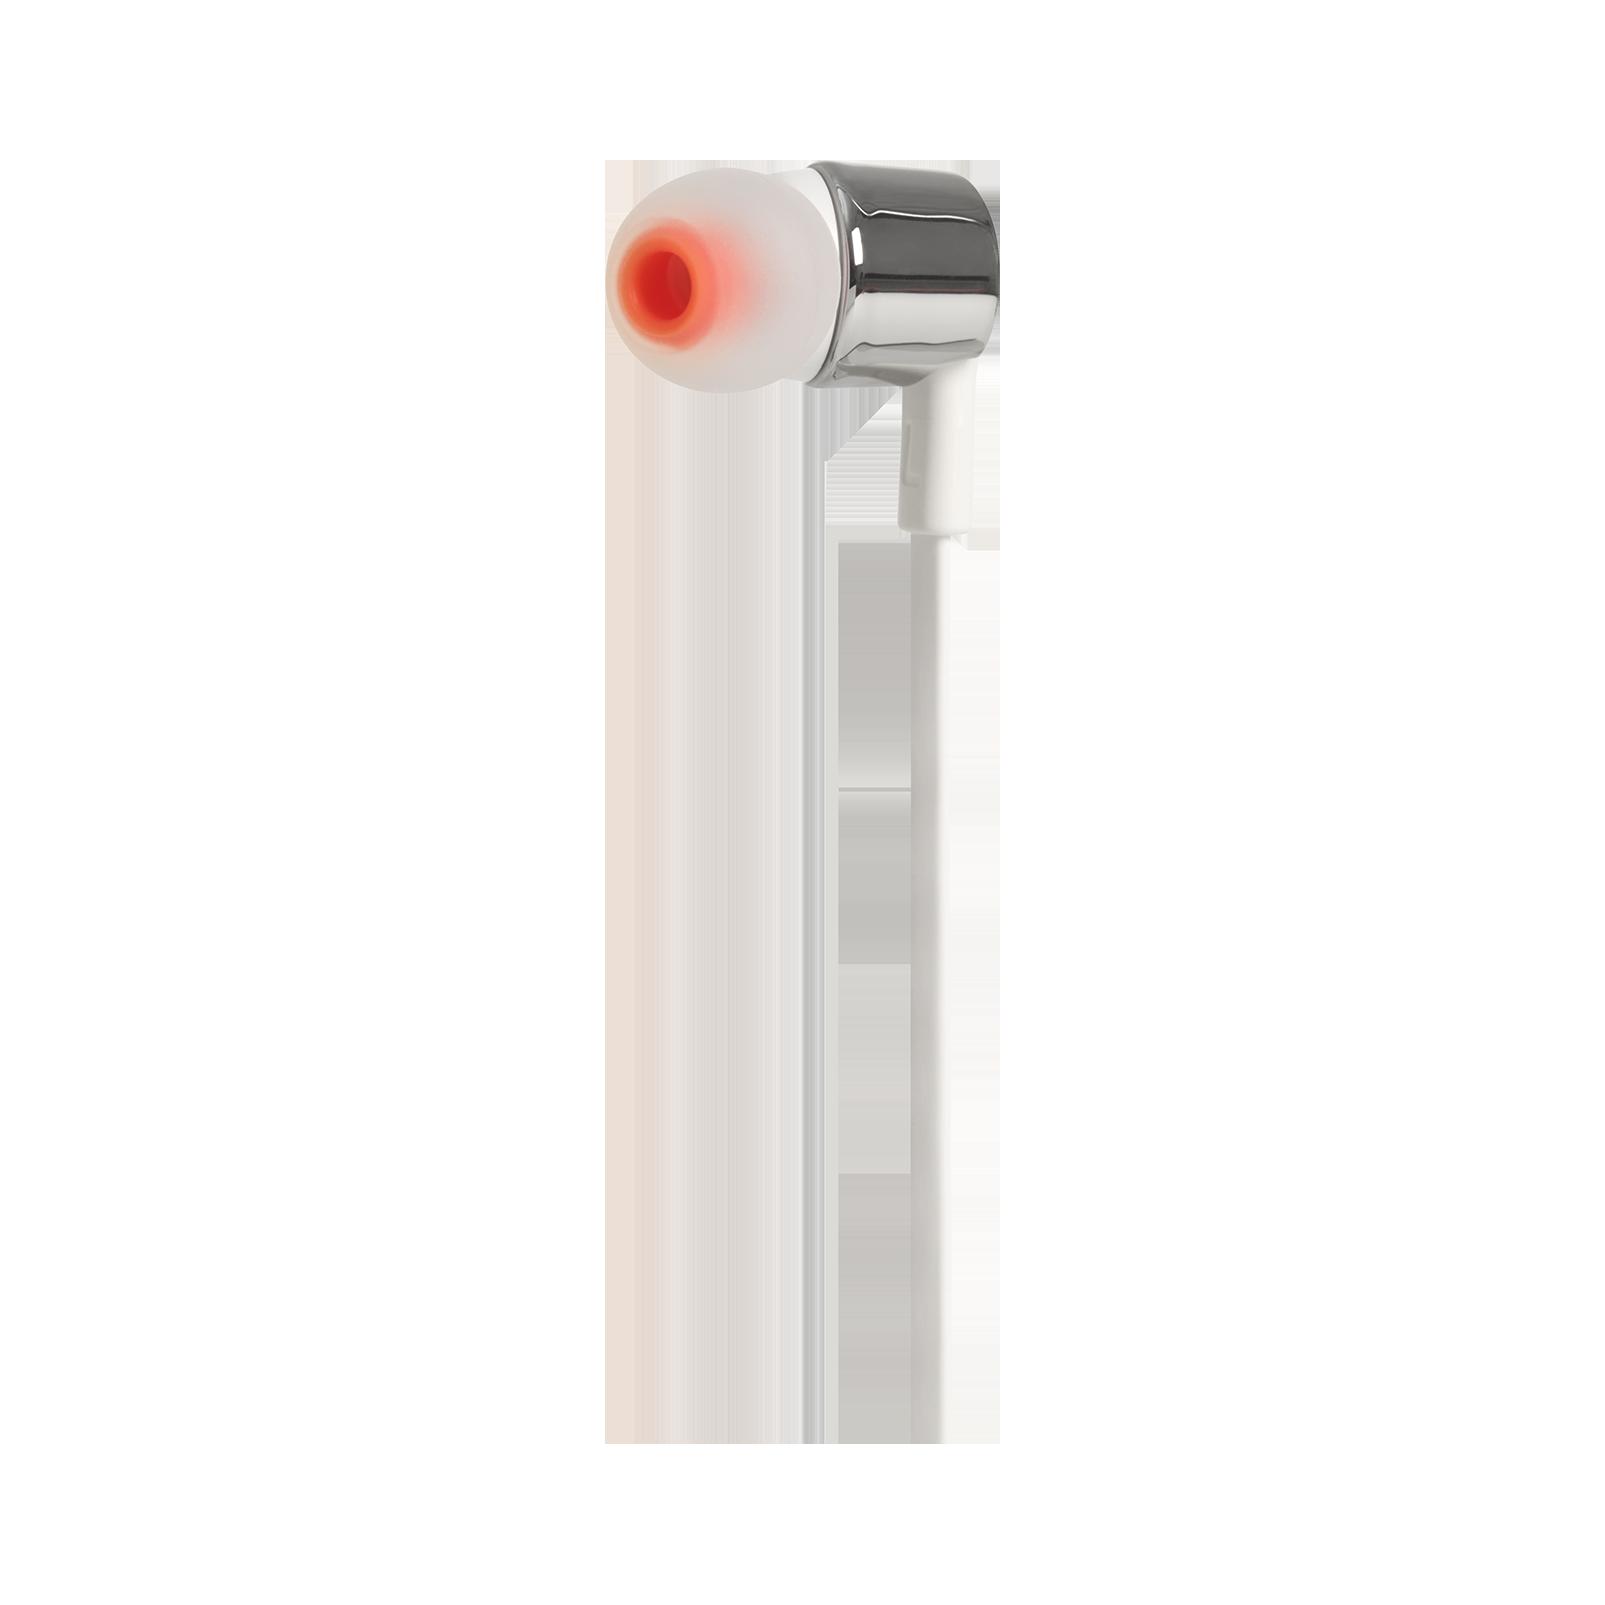 JBL TUNE 210 - Grey - In-ear headphones - Detailshot 3